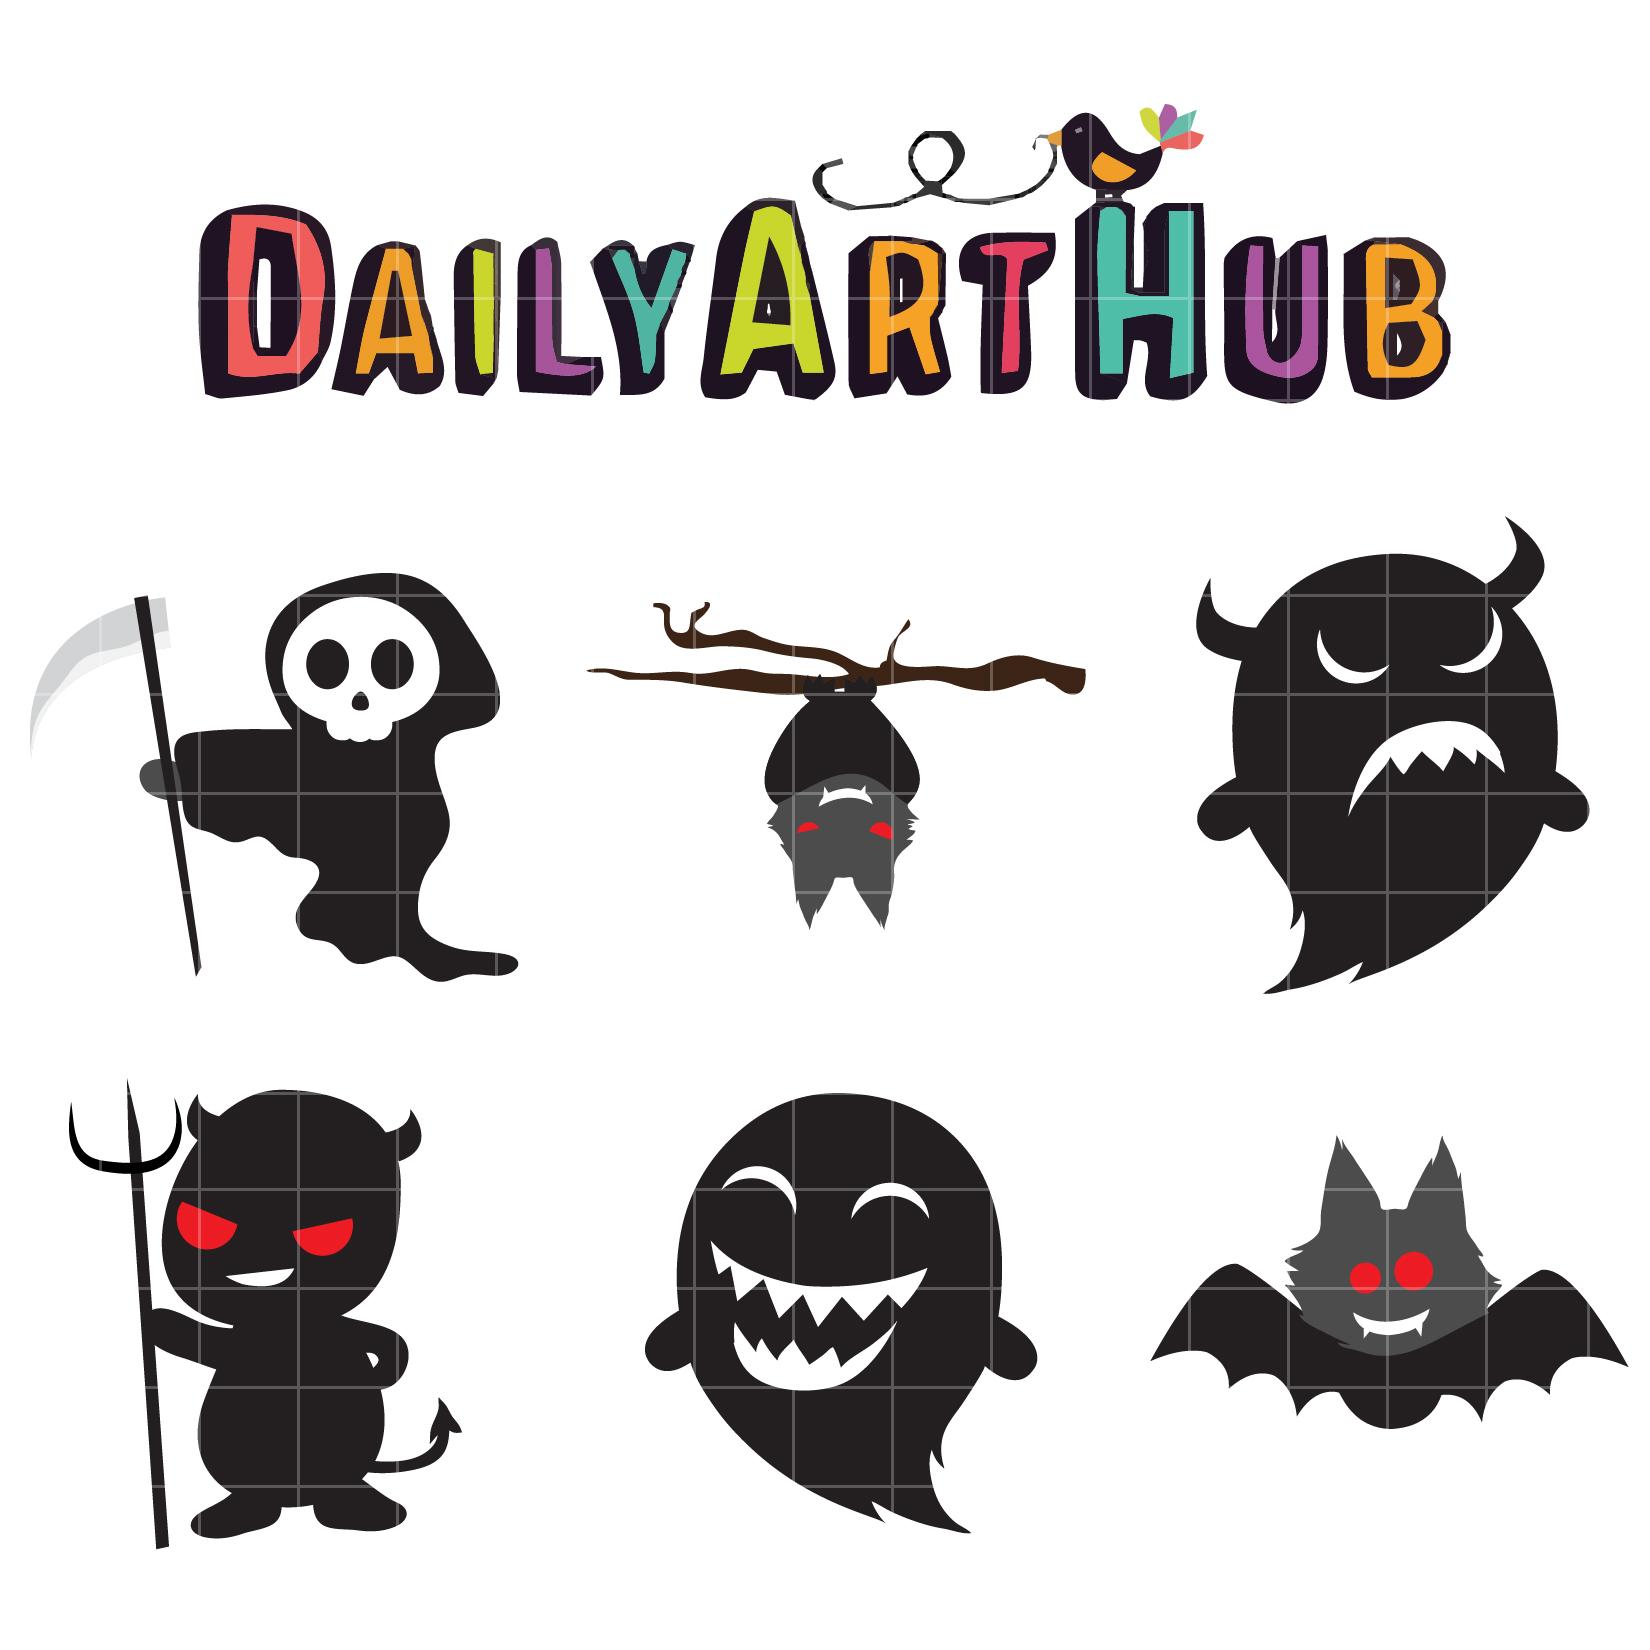 Spooky Halloween Clip Art Set | Daily Art Hub